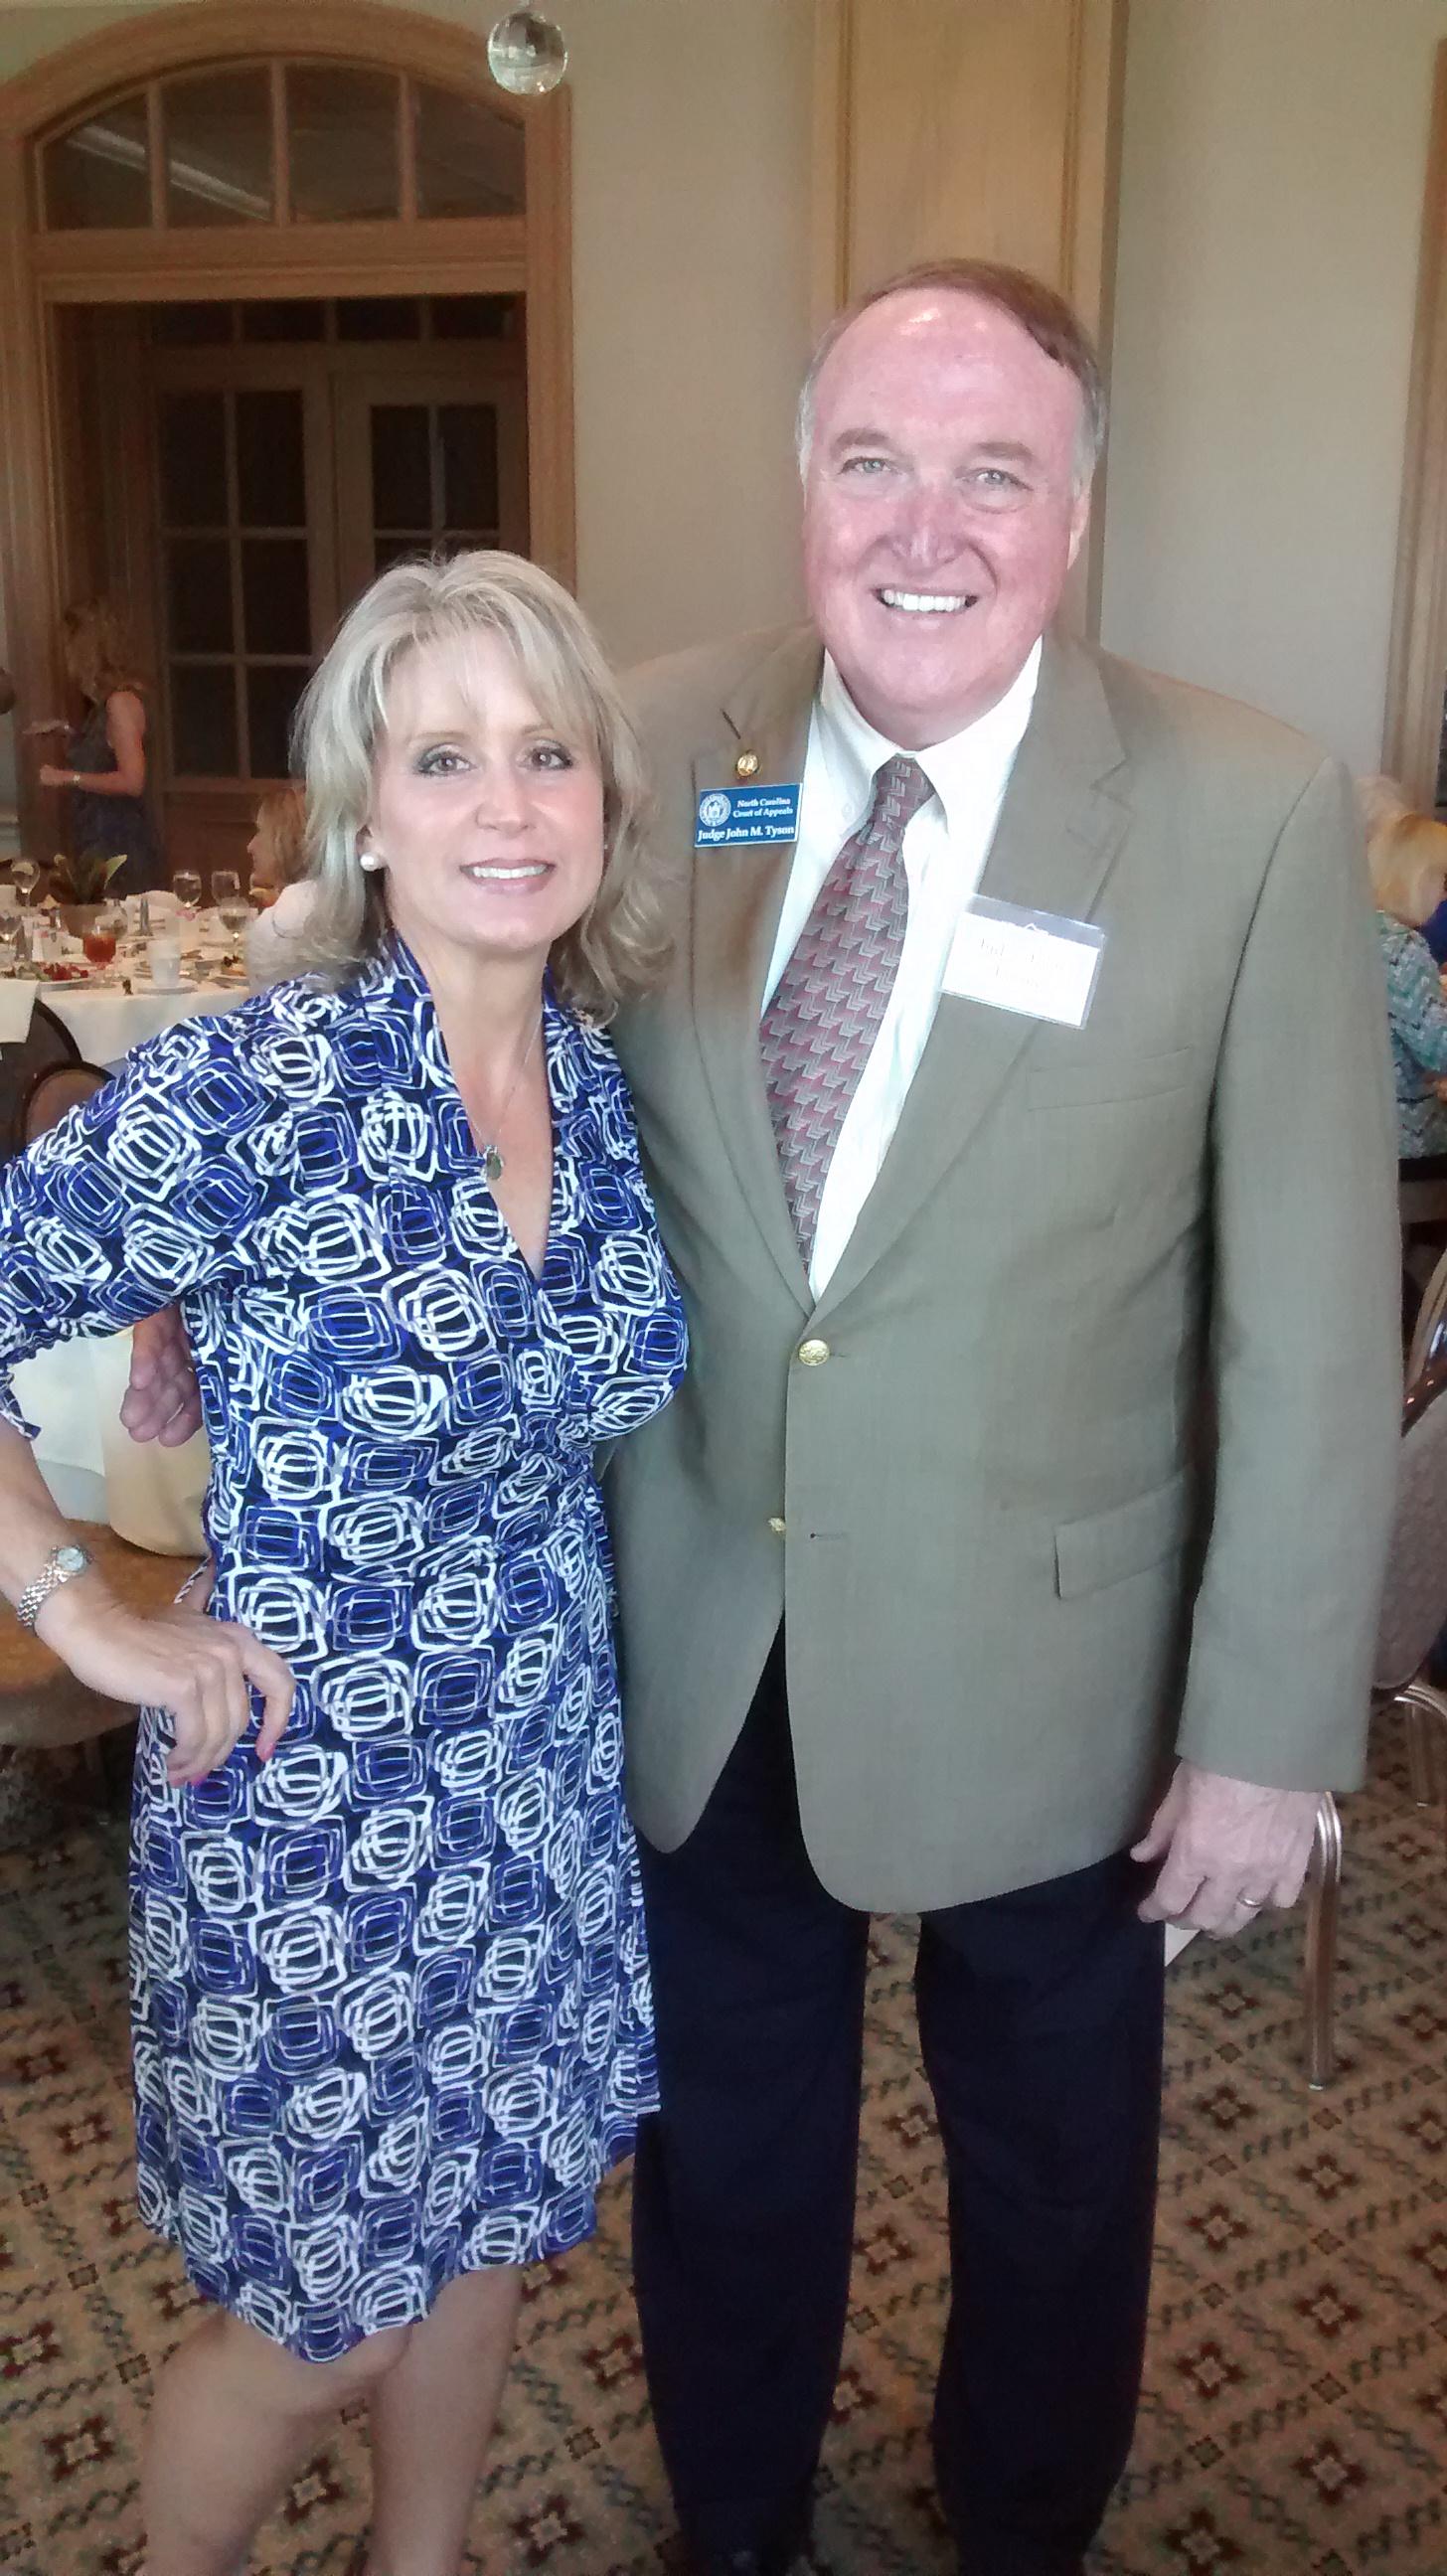 Judge Tyson and Congresswoman Renee Ellmers